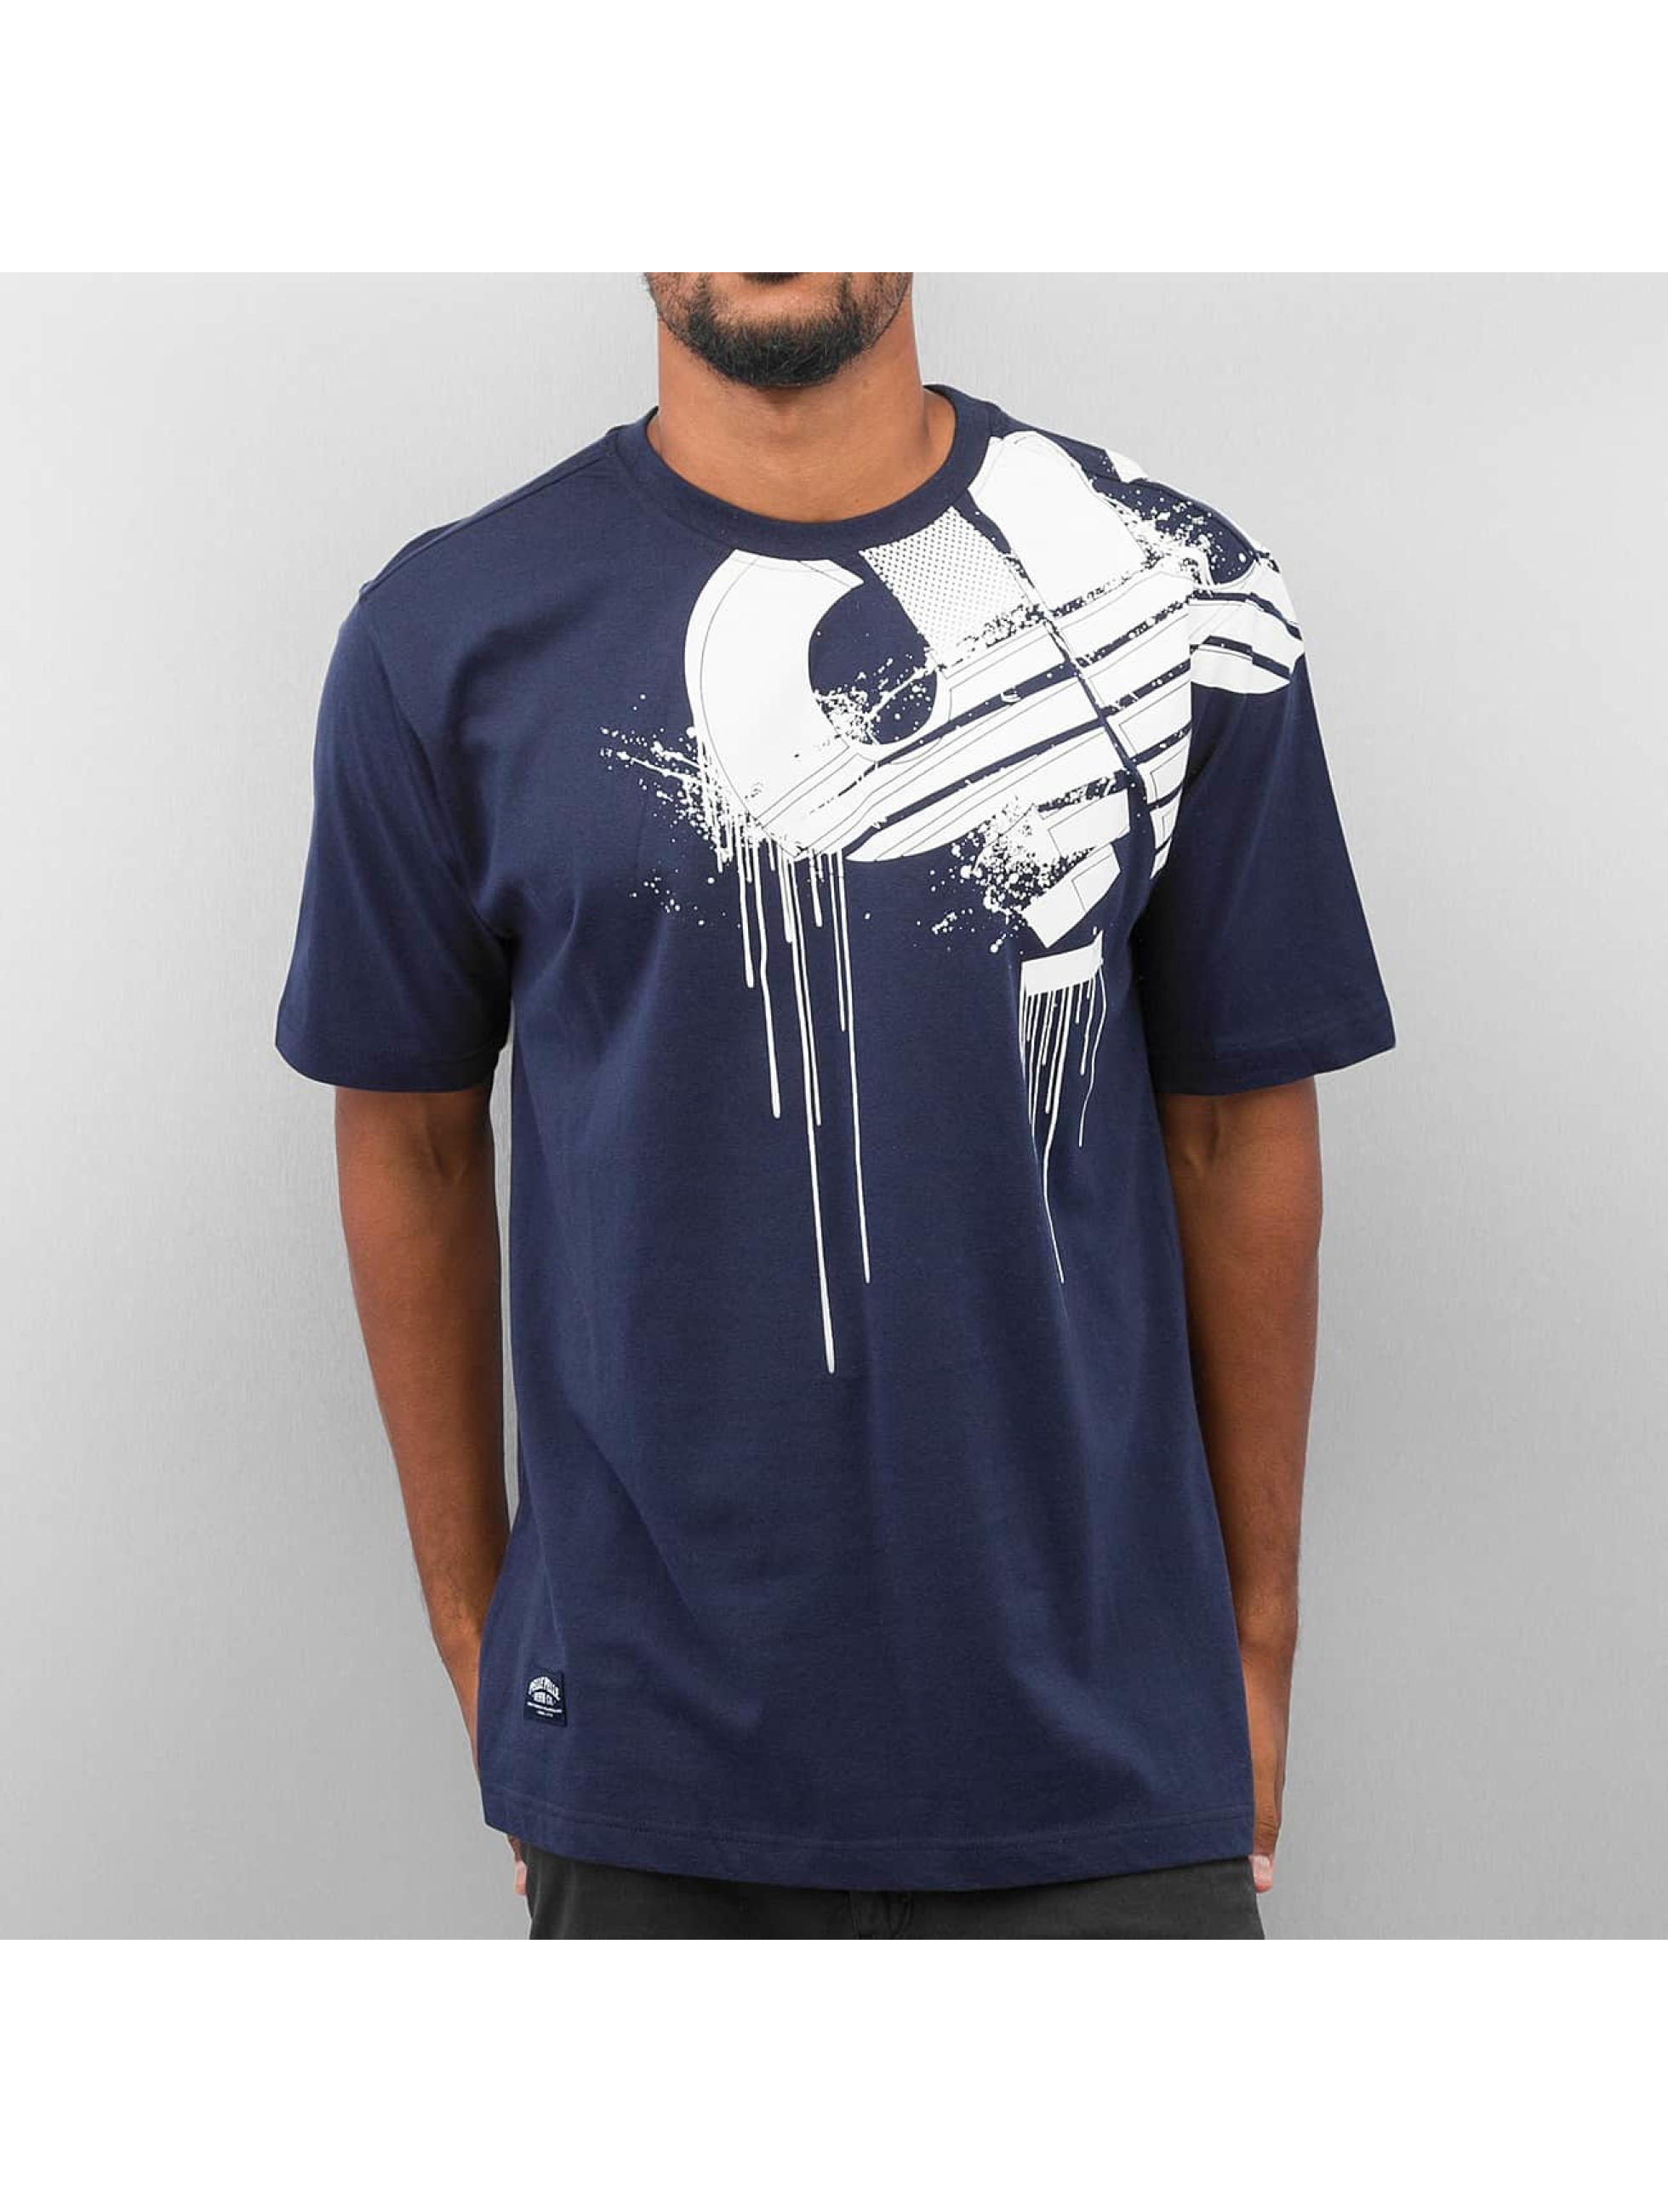 Pelle Pelle T-Shirt Demolition bleu